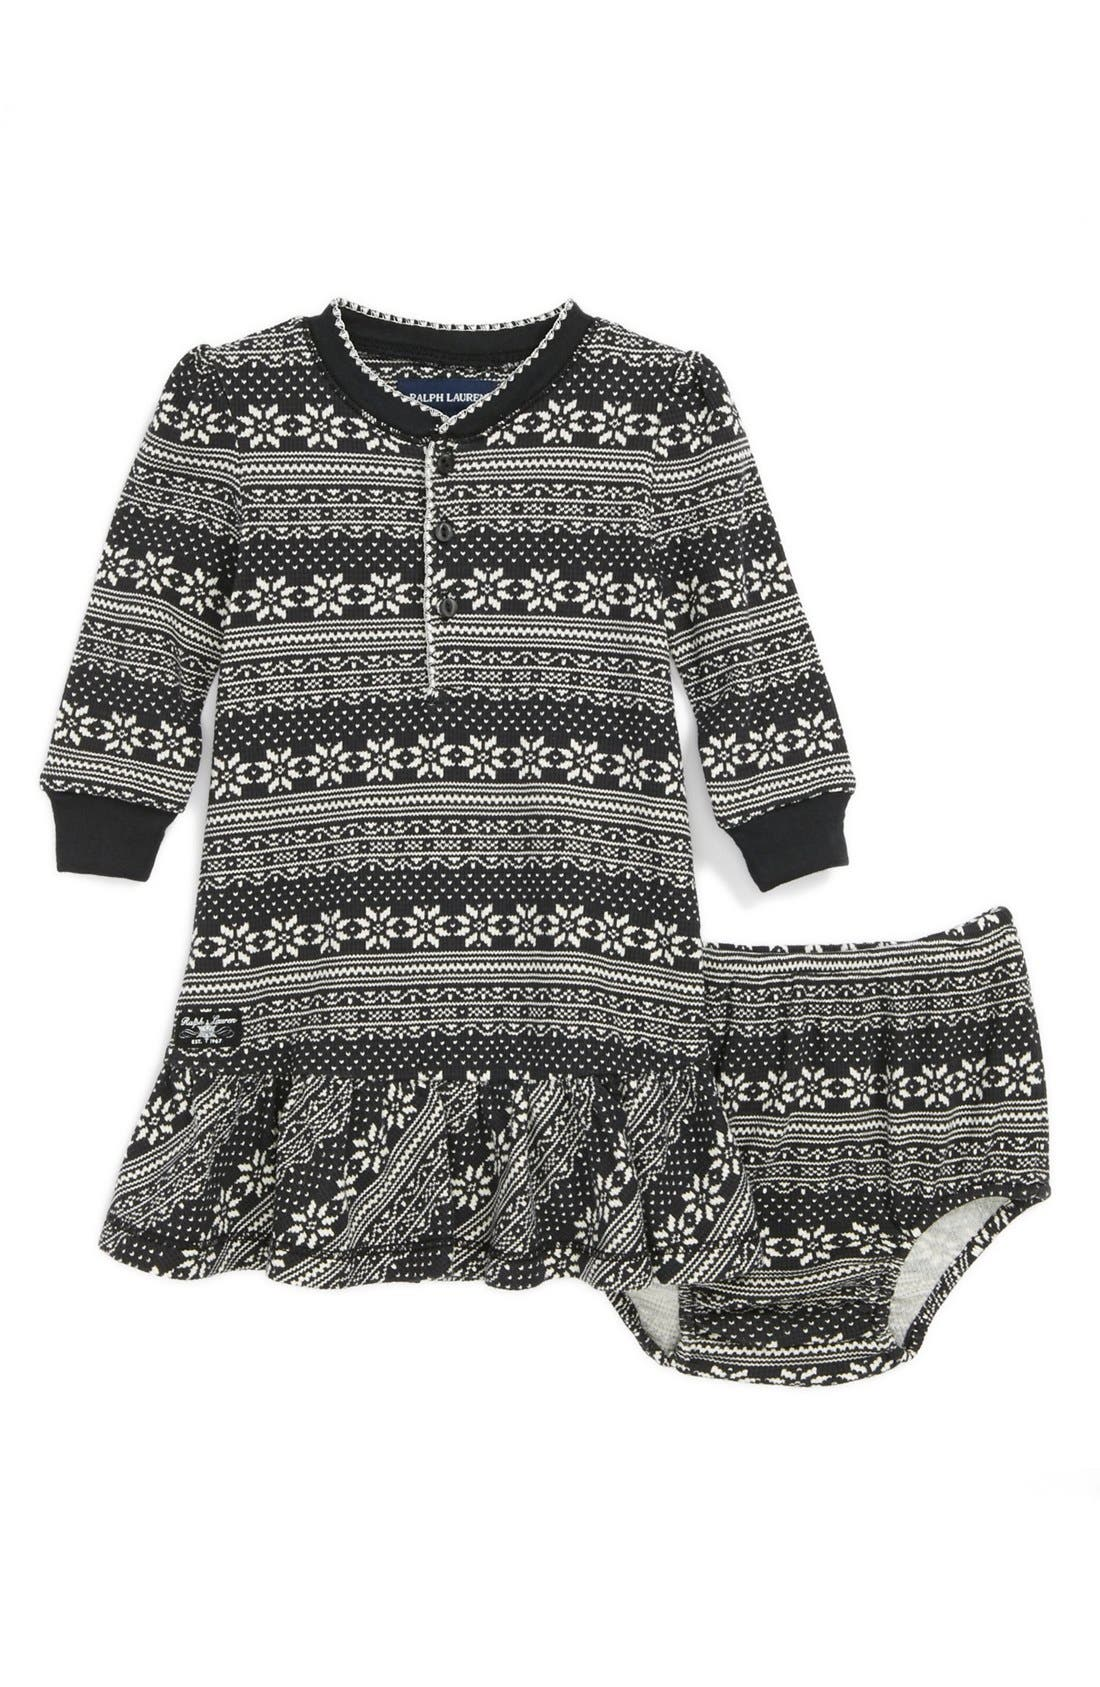 Main Image - Ralph Lauren Print Dress & Bloomers (Baby Girls)